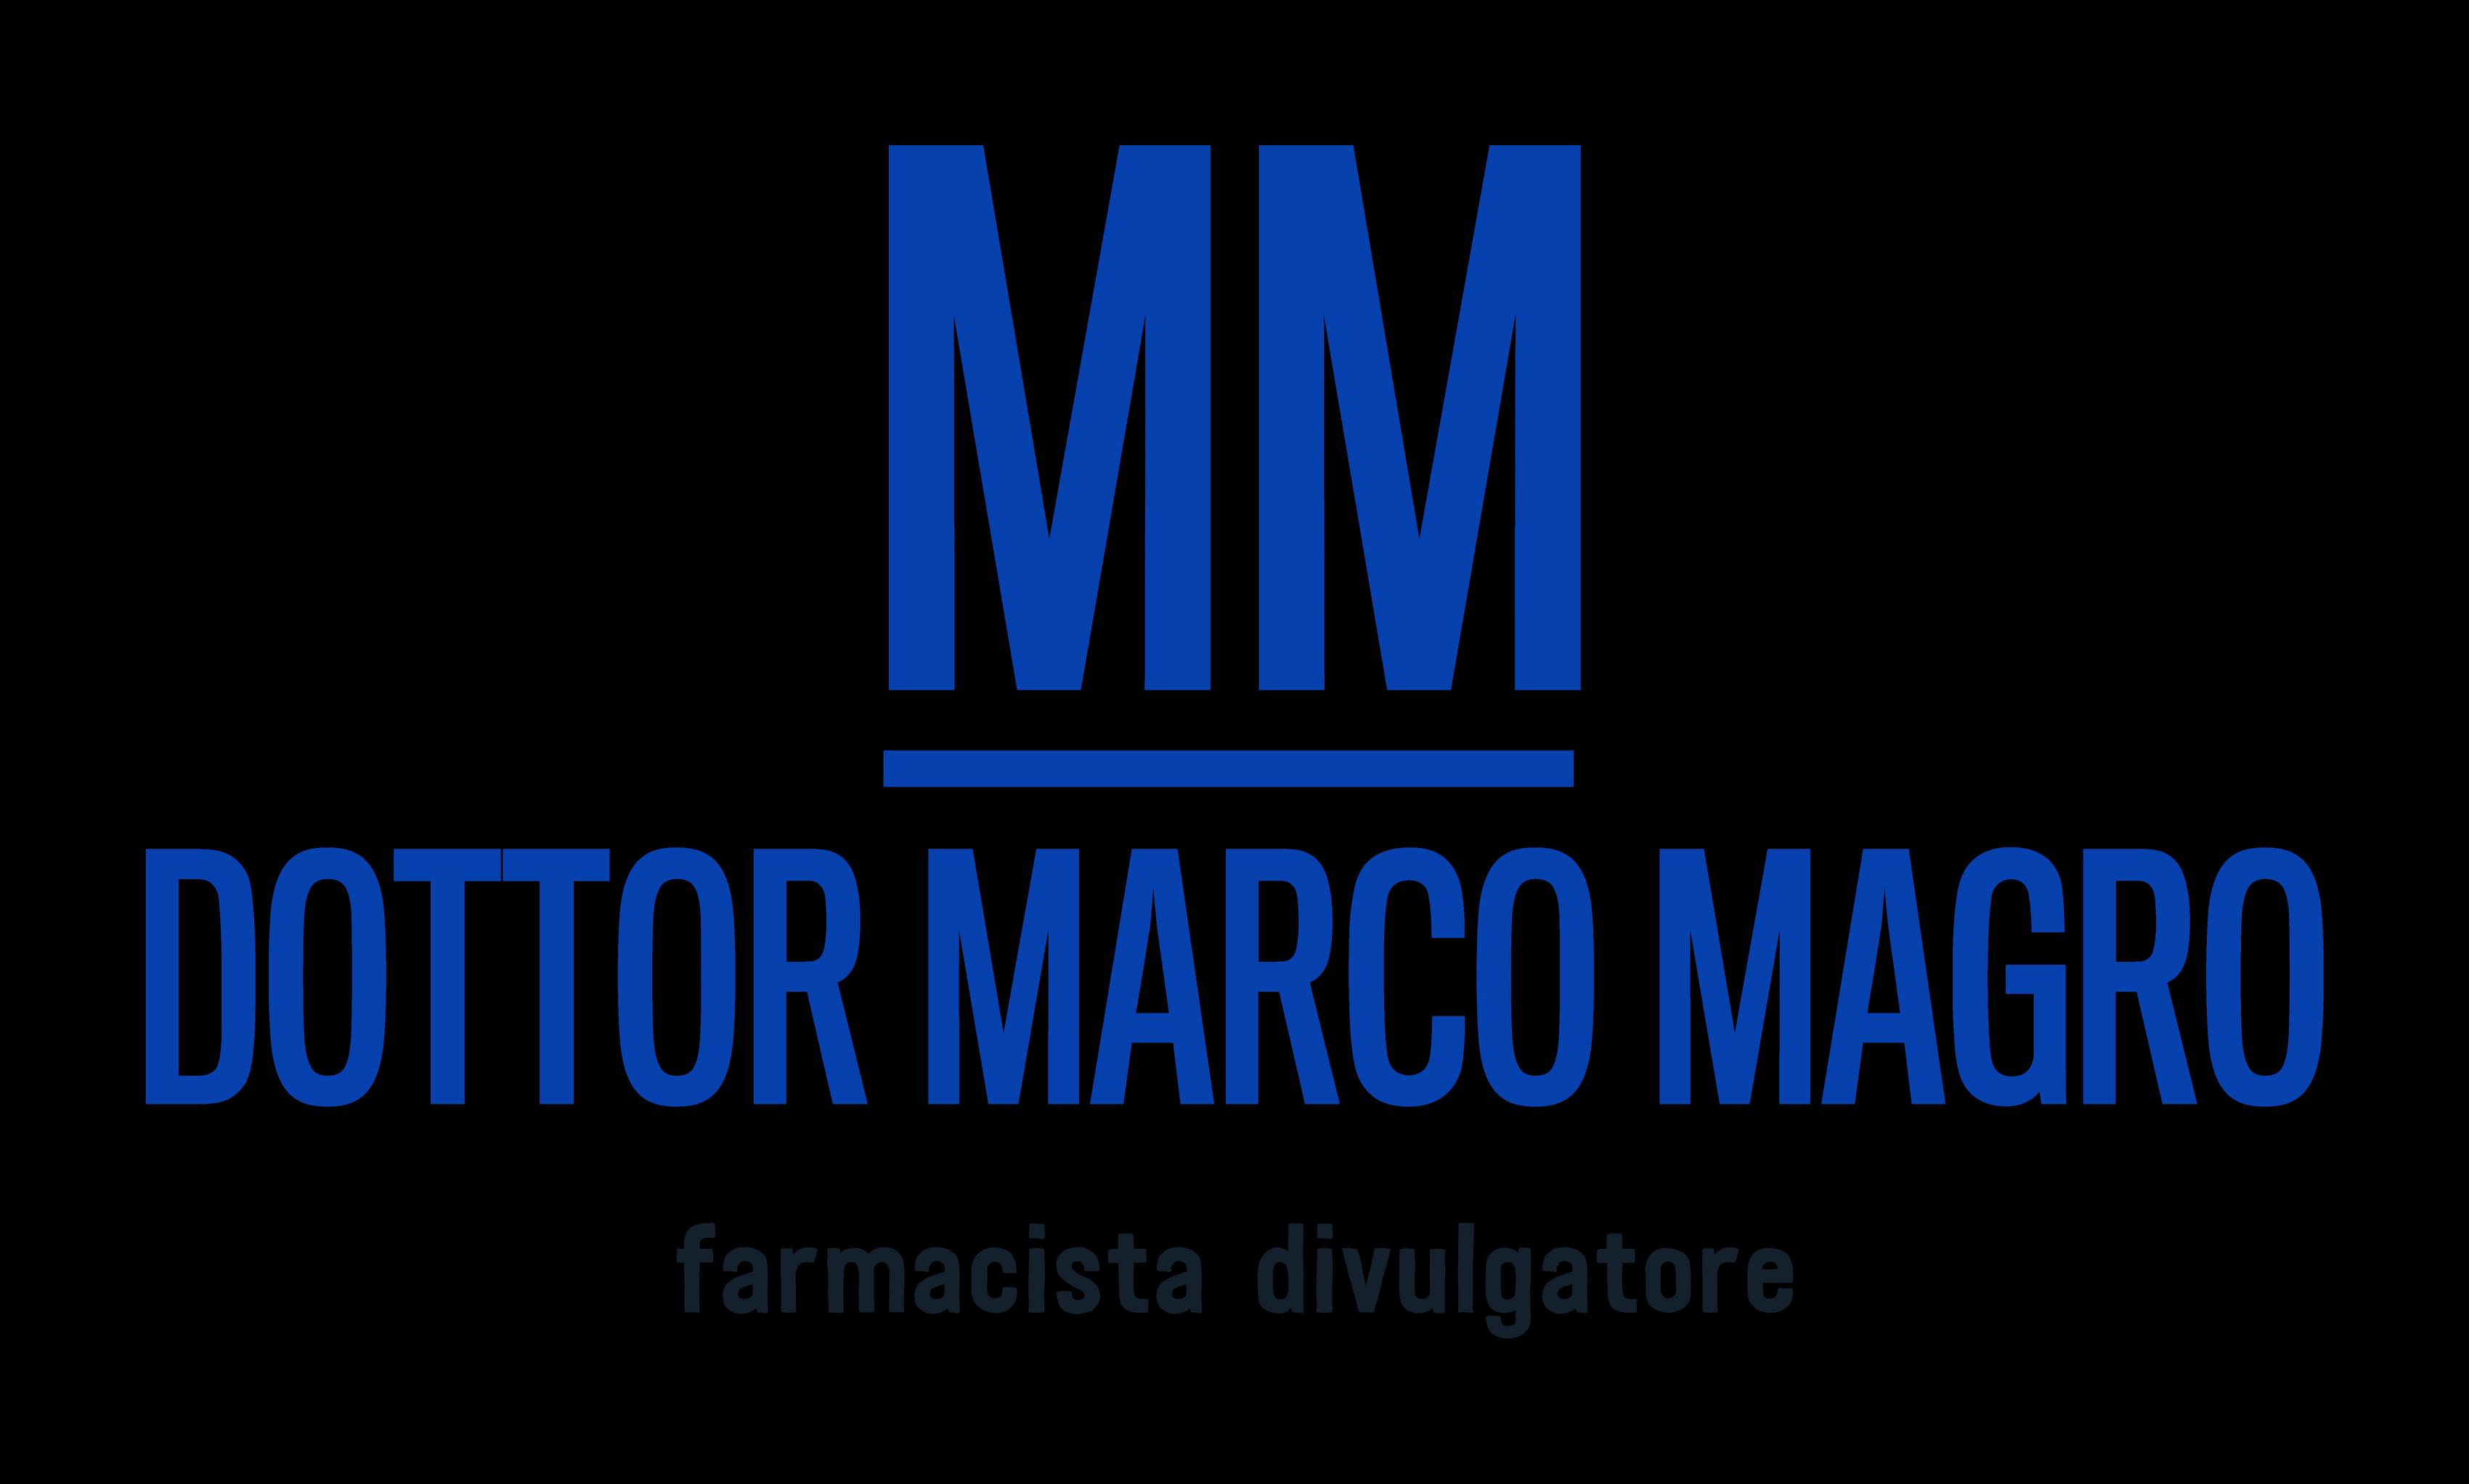 Logo Marco Magro - Farmacista divulgatore